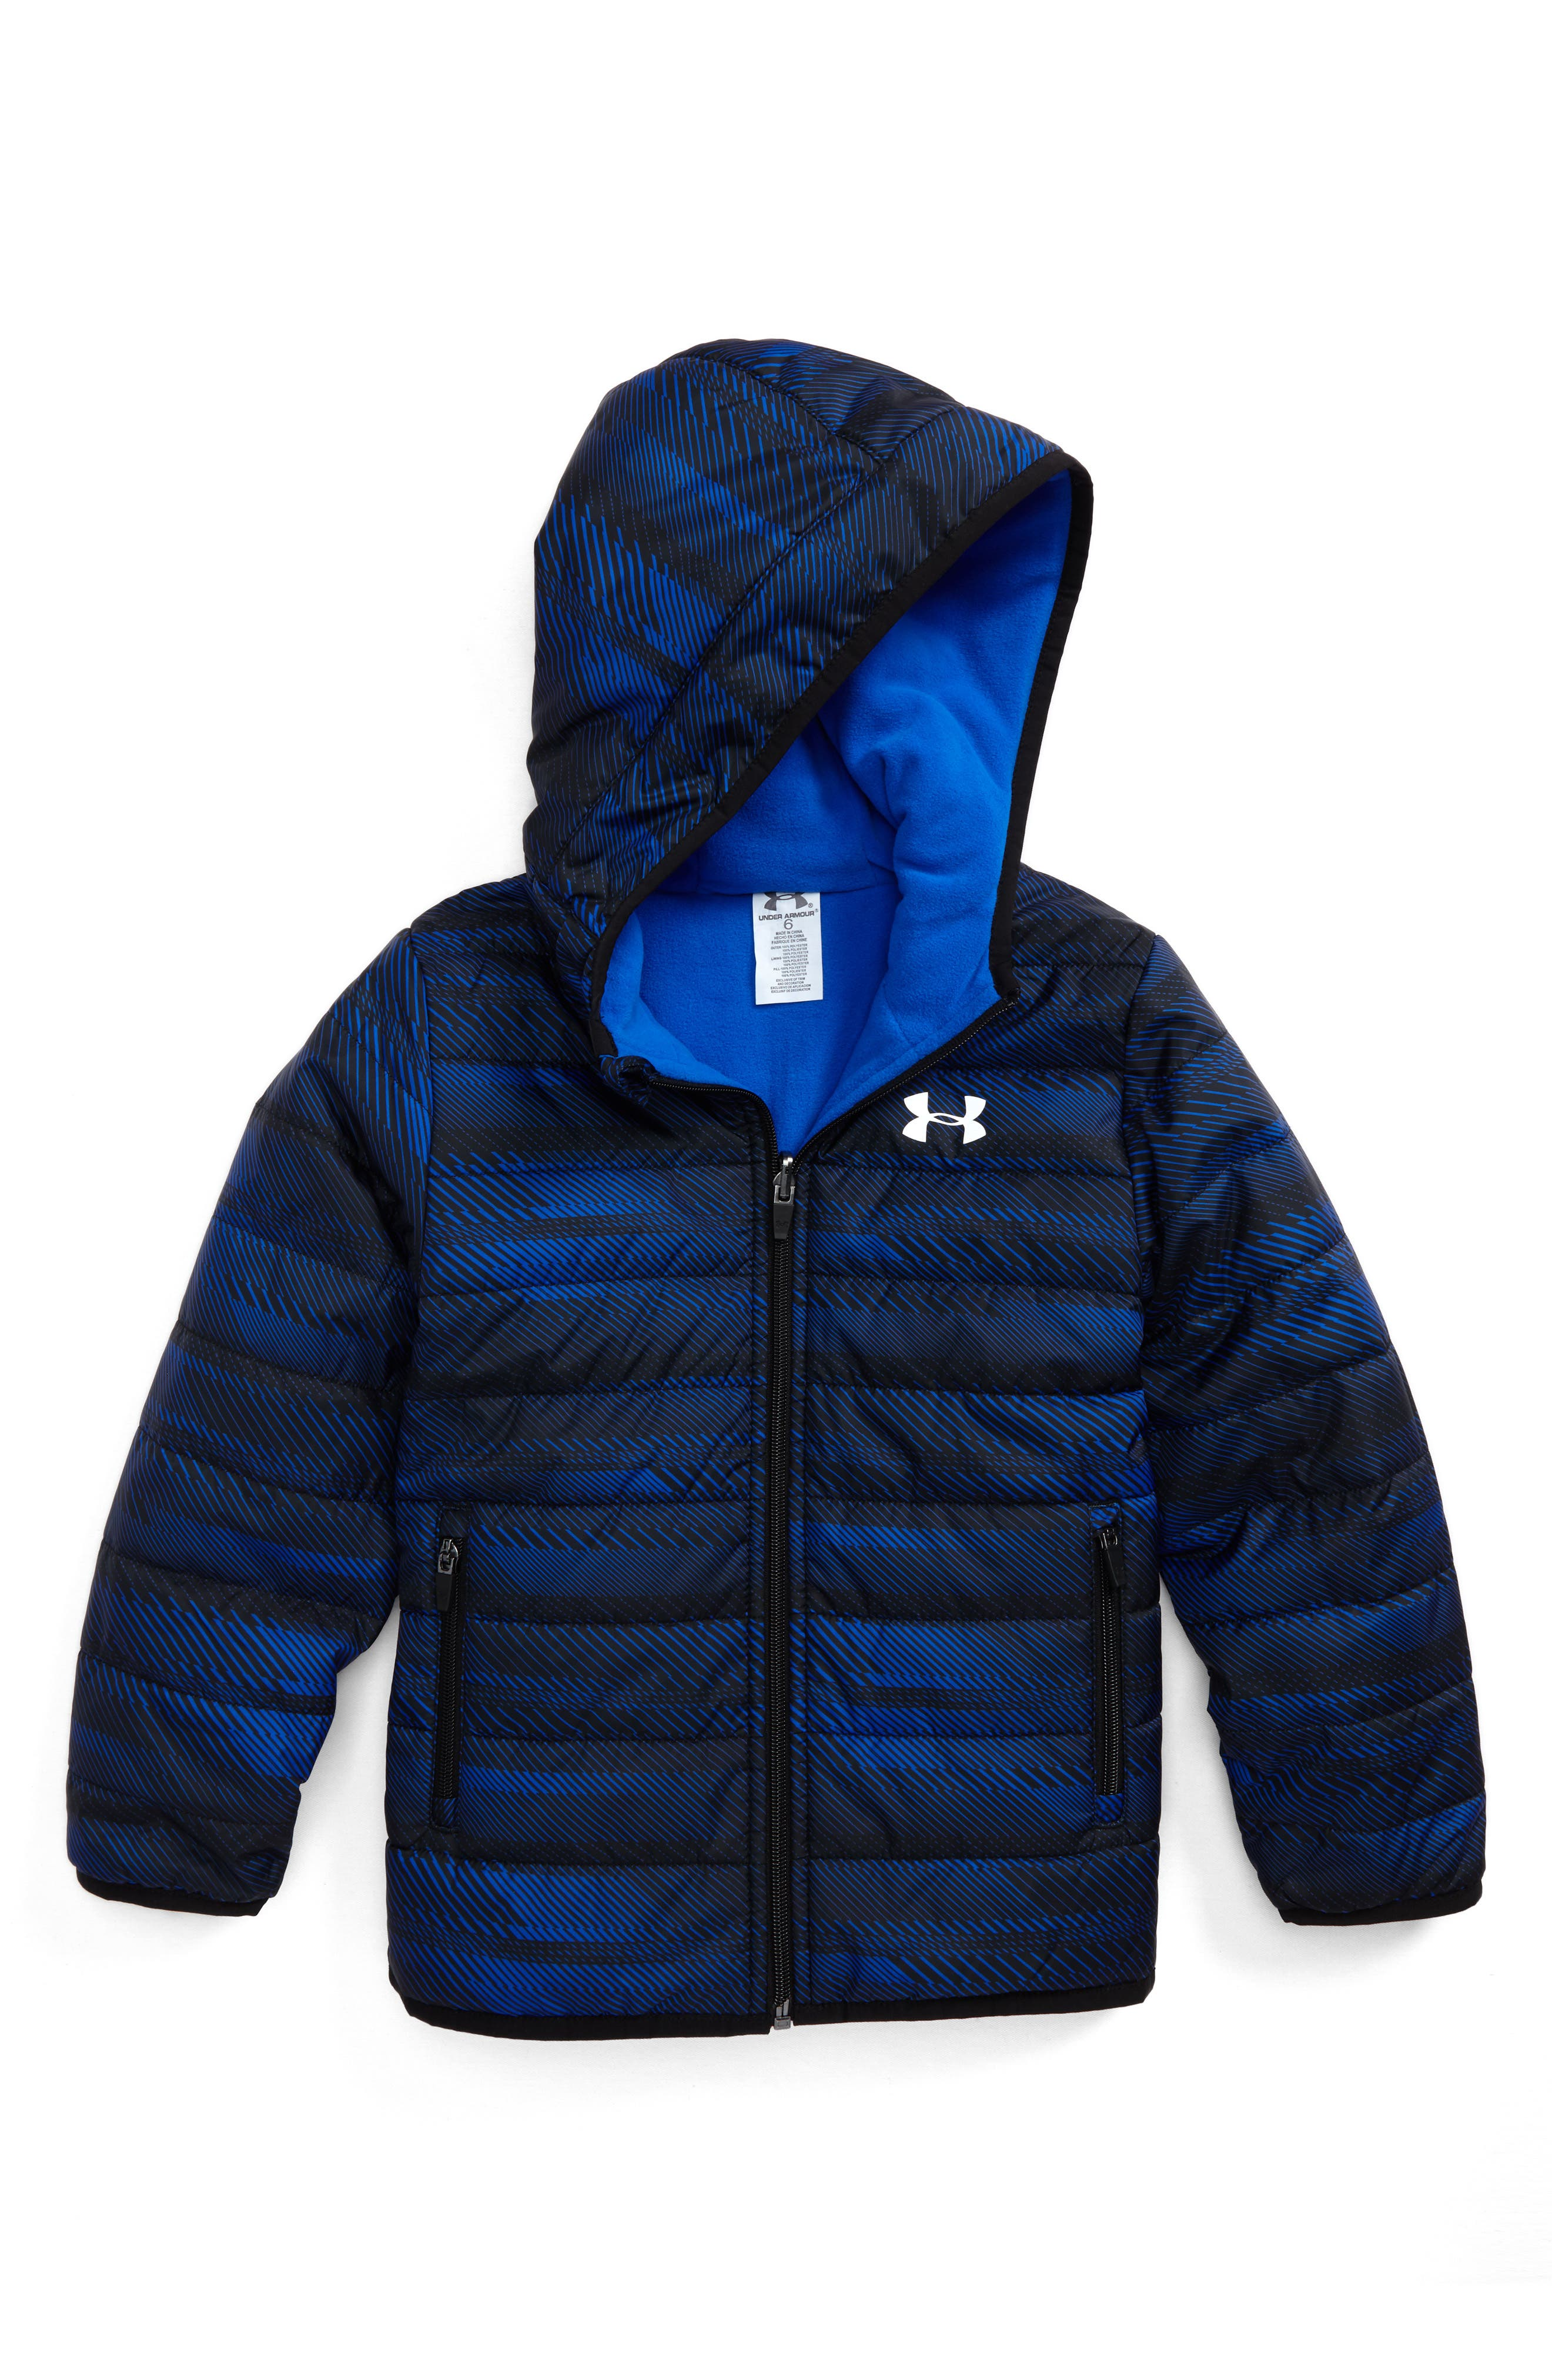 Alternate Image 1 Selected - Under Armour Speedlines ColdGear® Reversible Puffer Jacket (Toddler Boys & Little Boys)